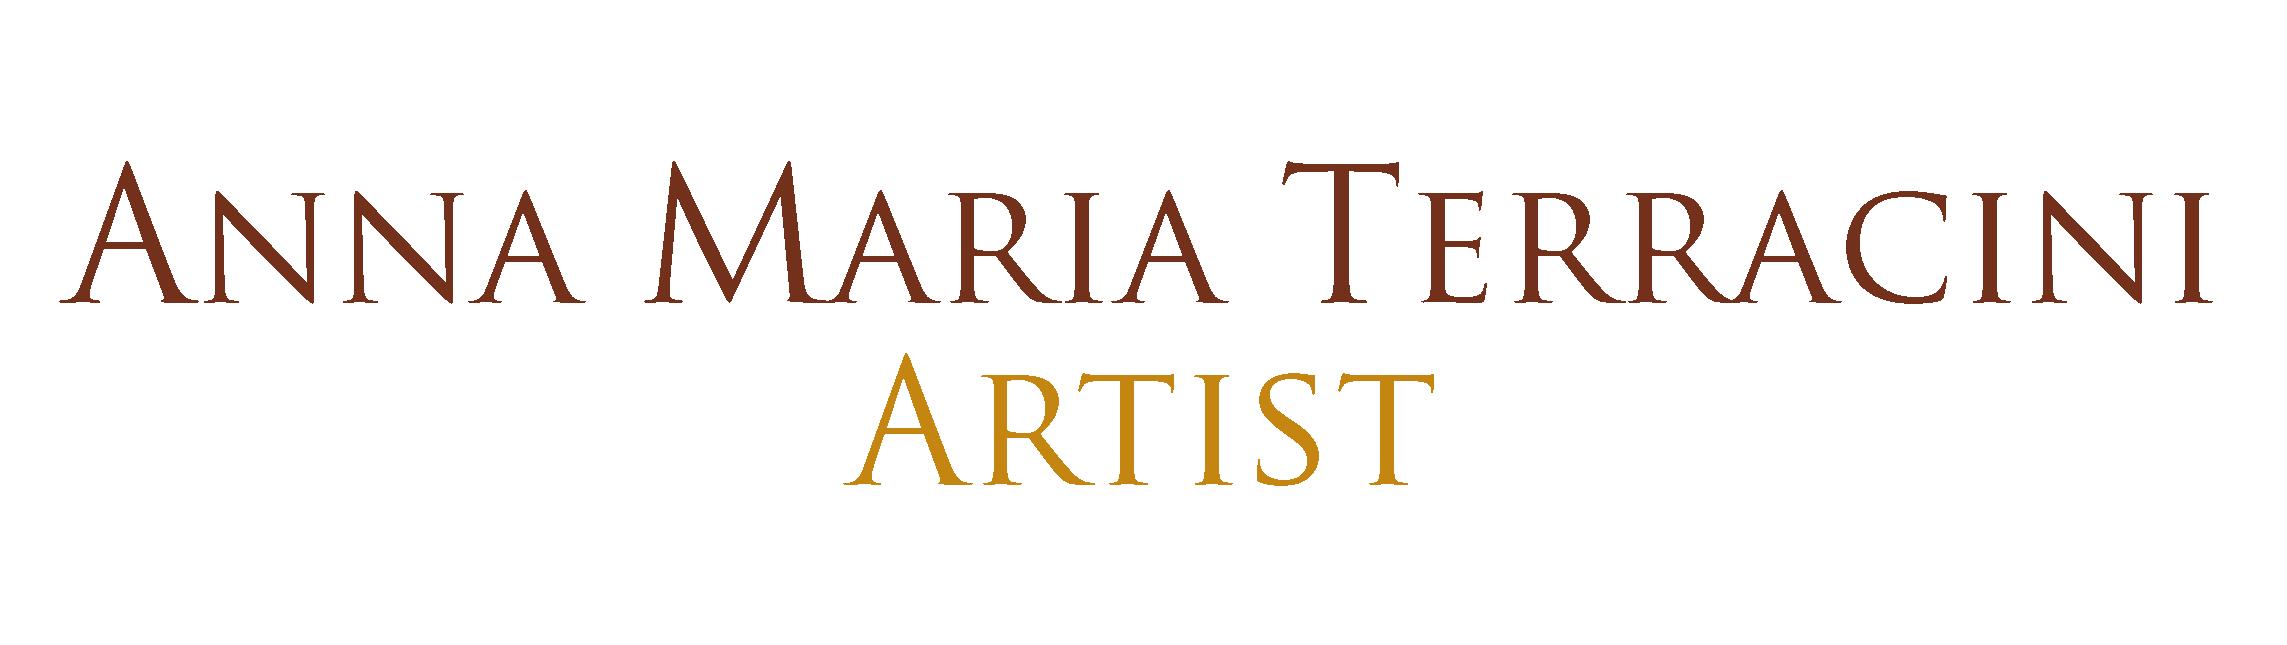 Terracini Artist